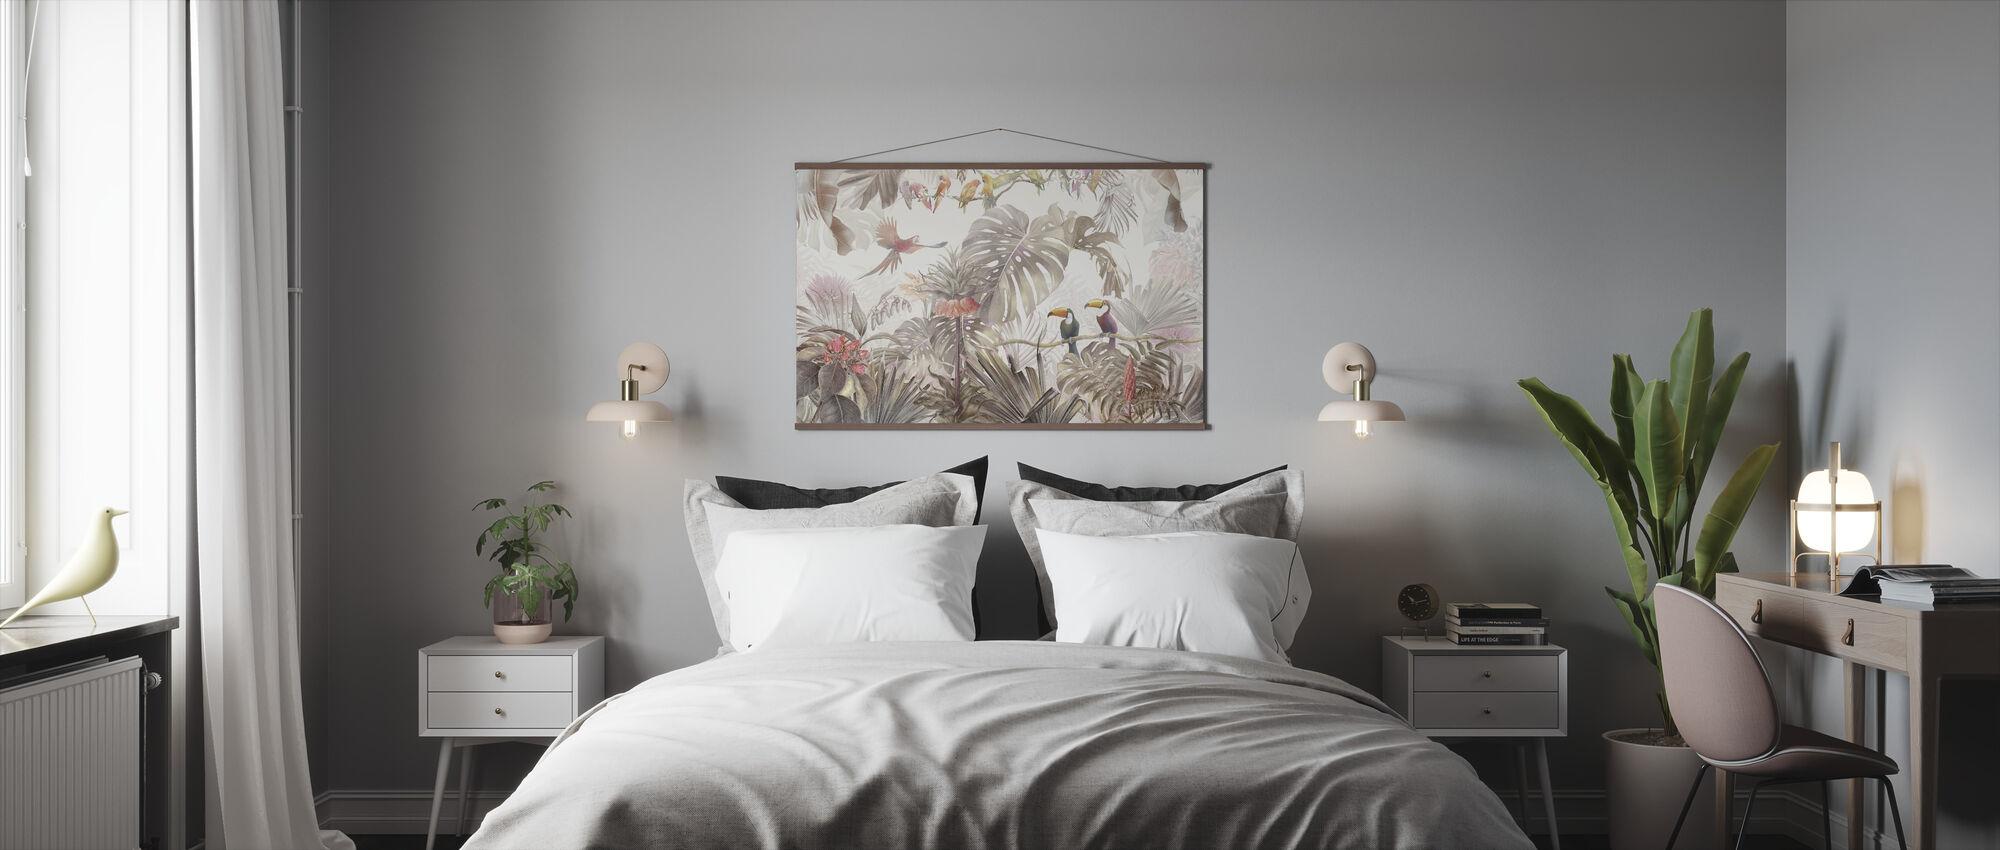 Tropische Vögel - Poster - Schlafzimmer